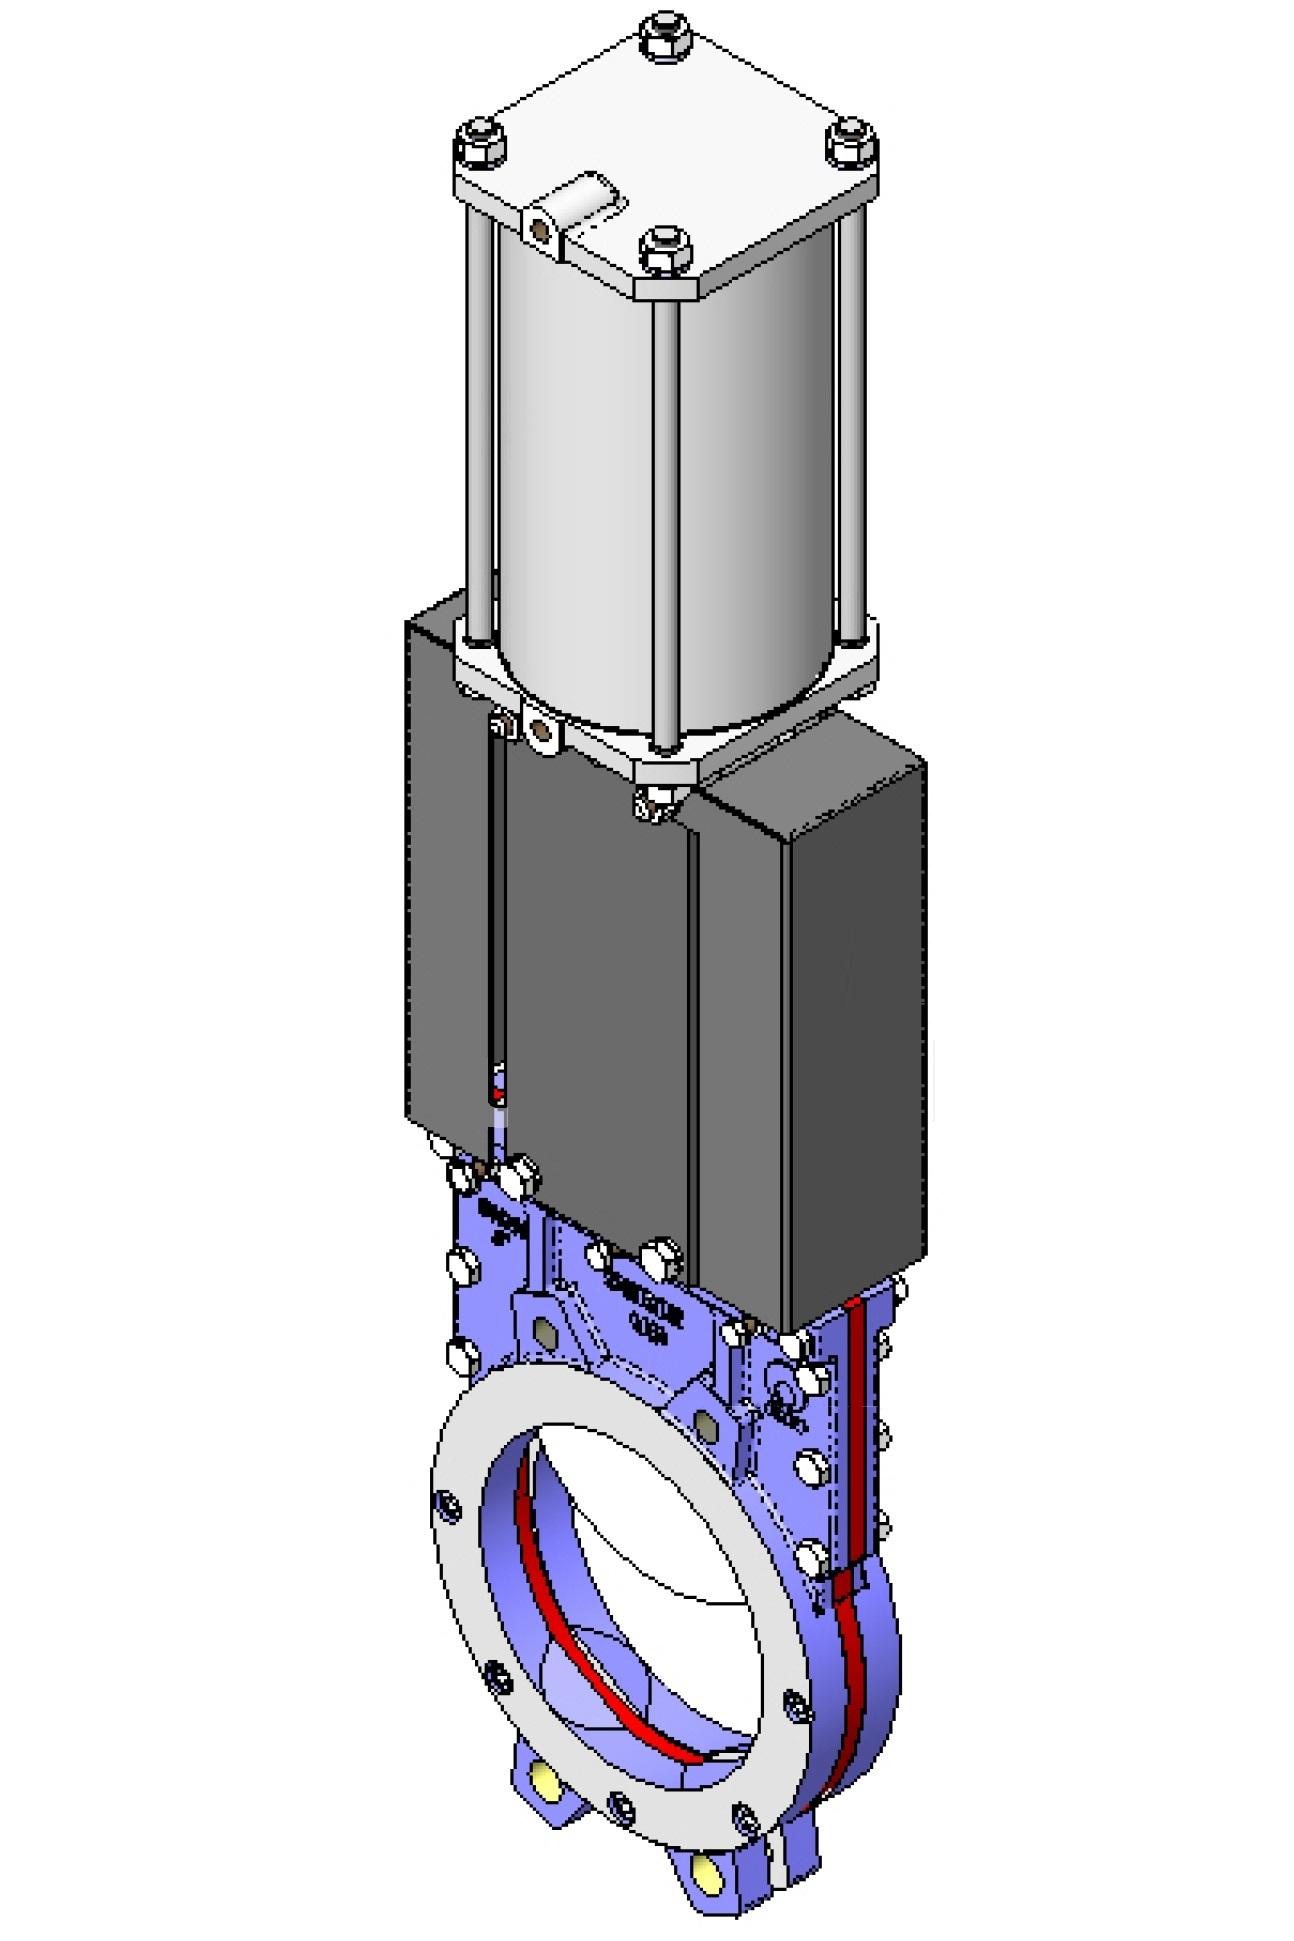 Задвижка шиберная чугунная межфланцевая с пневмоприводом СМО UB-012-01-1000-PN3-SsM-D/A-E